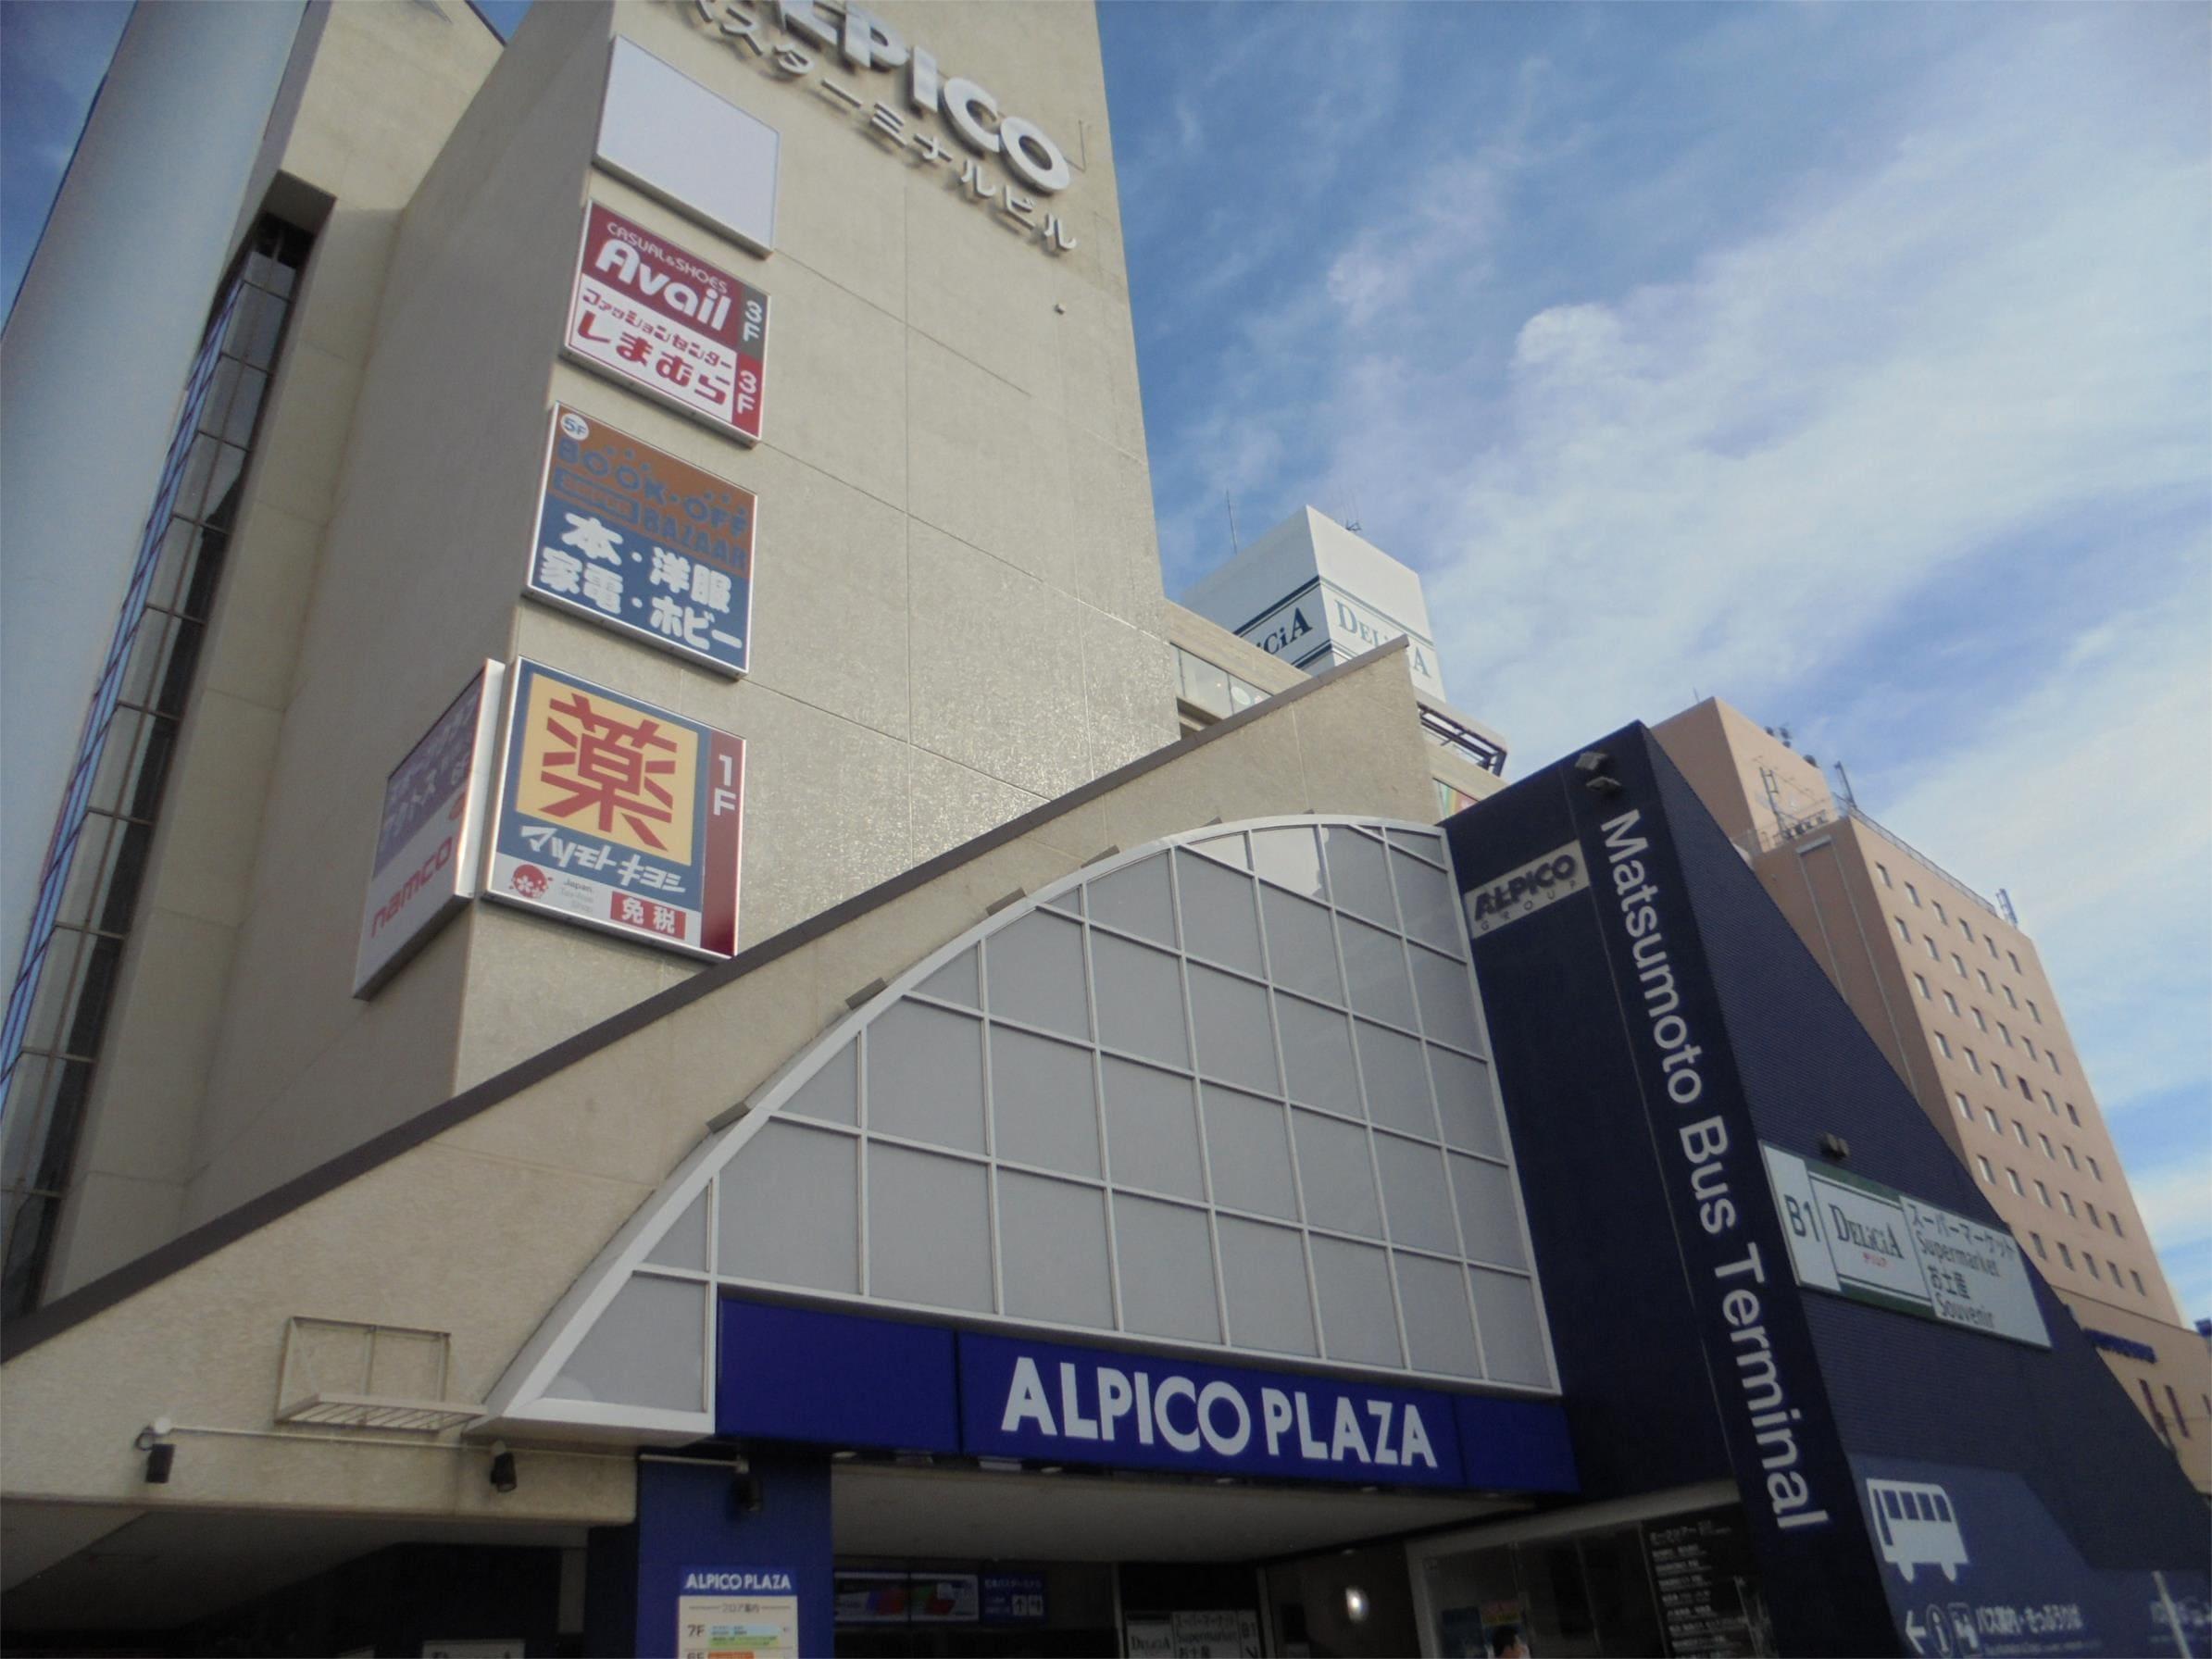 DELiCiA(デリシア) 松本駅前店(スーパー)まで560m